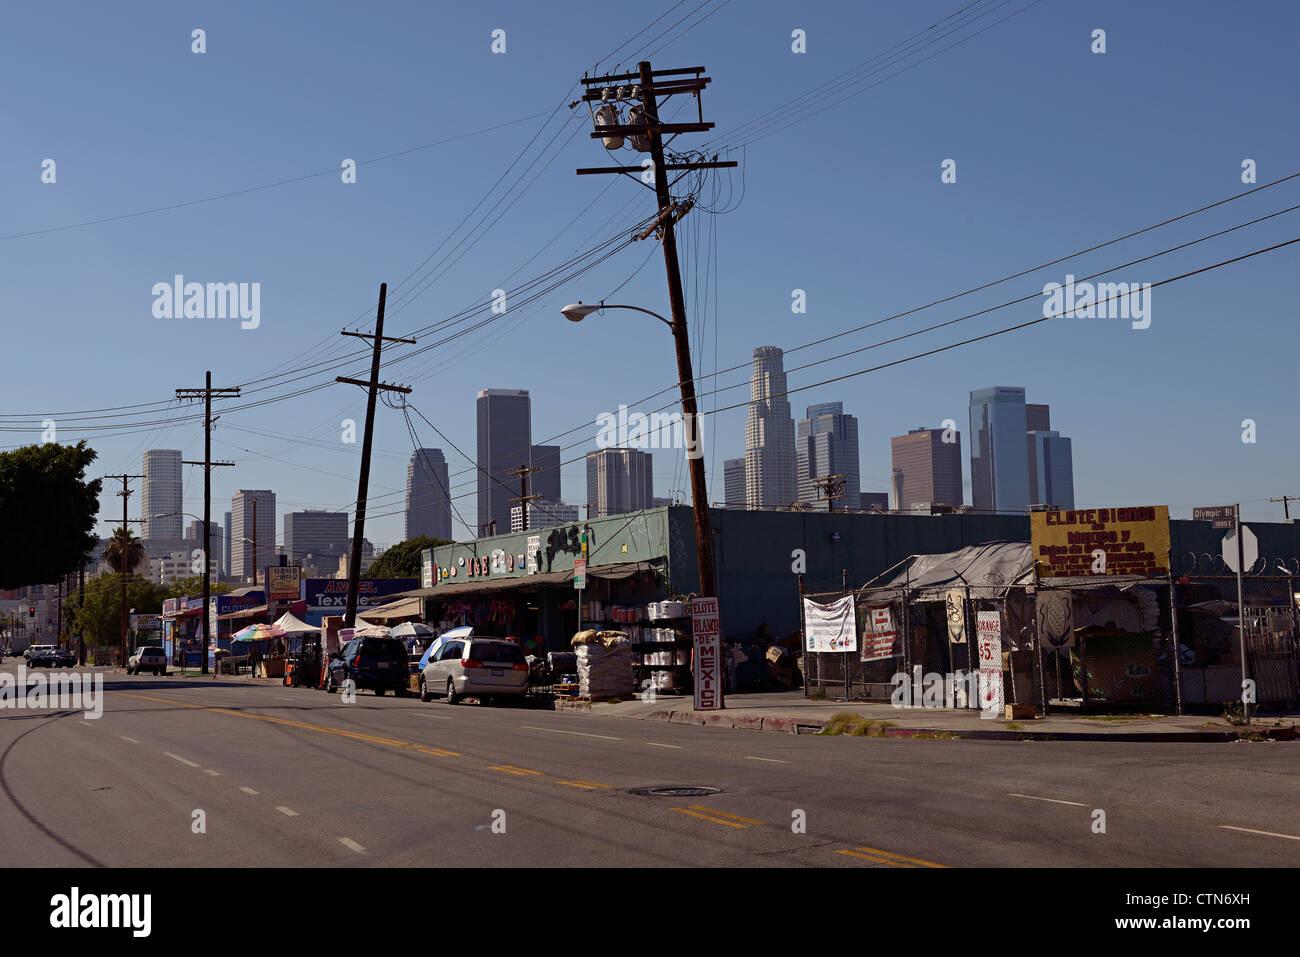 downtown la skyline - Stock Image